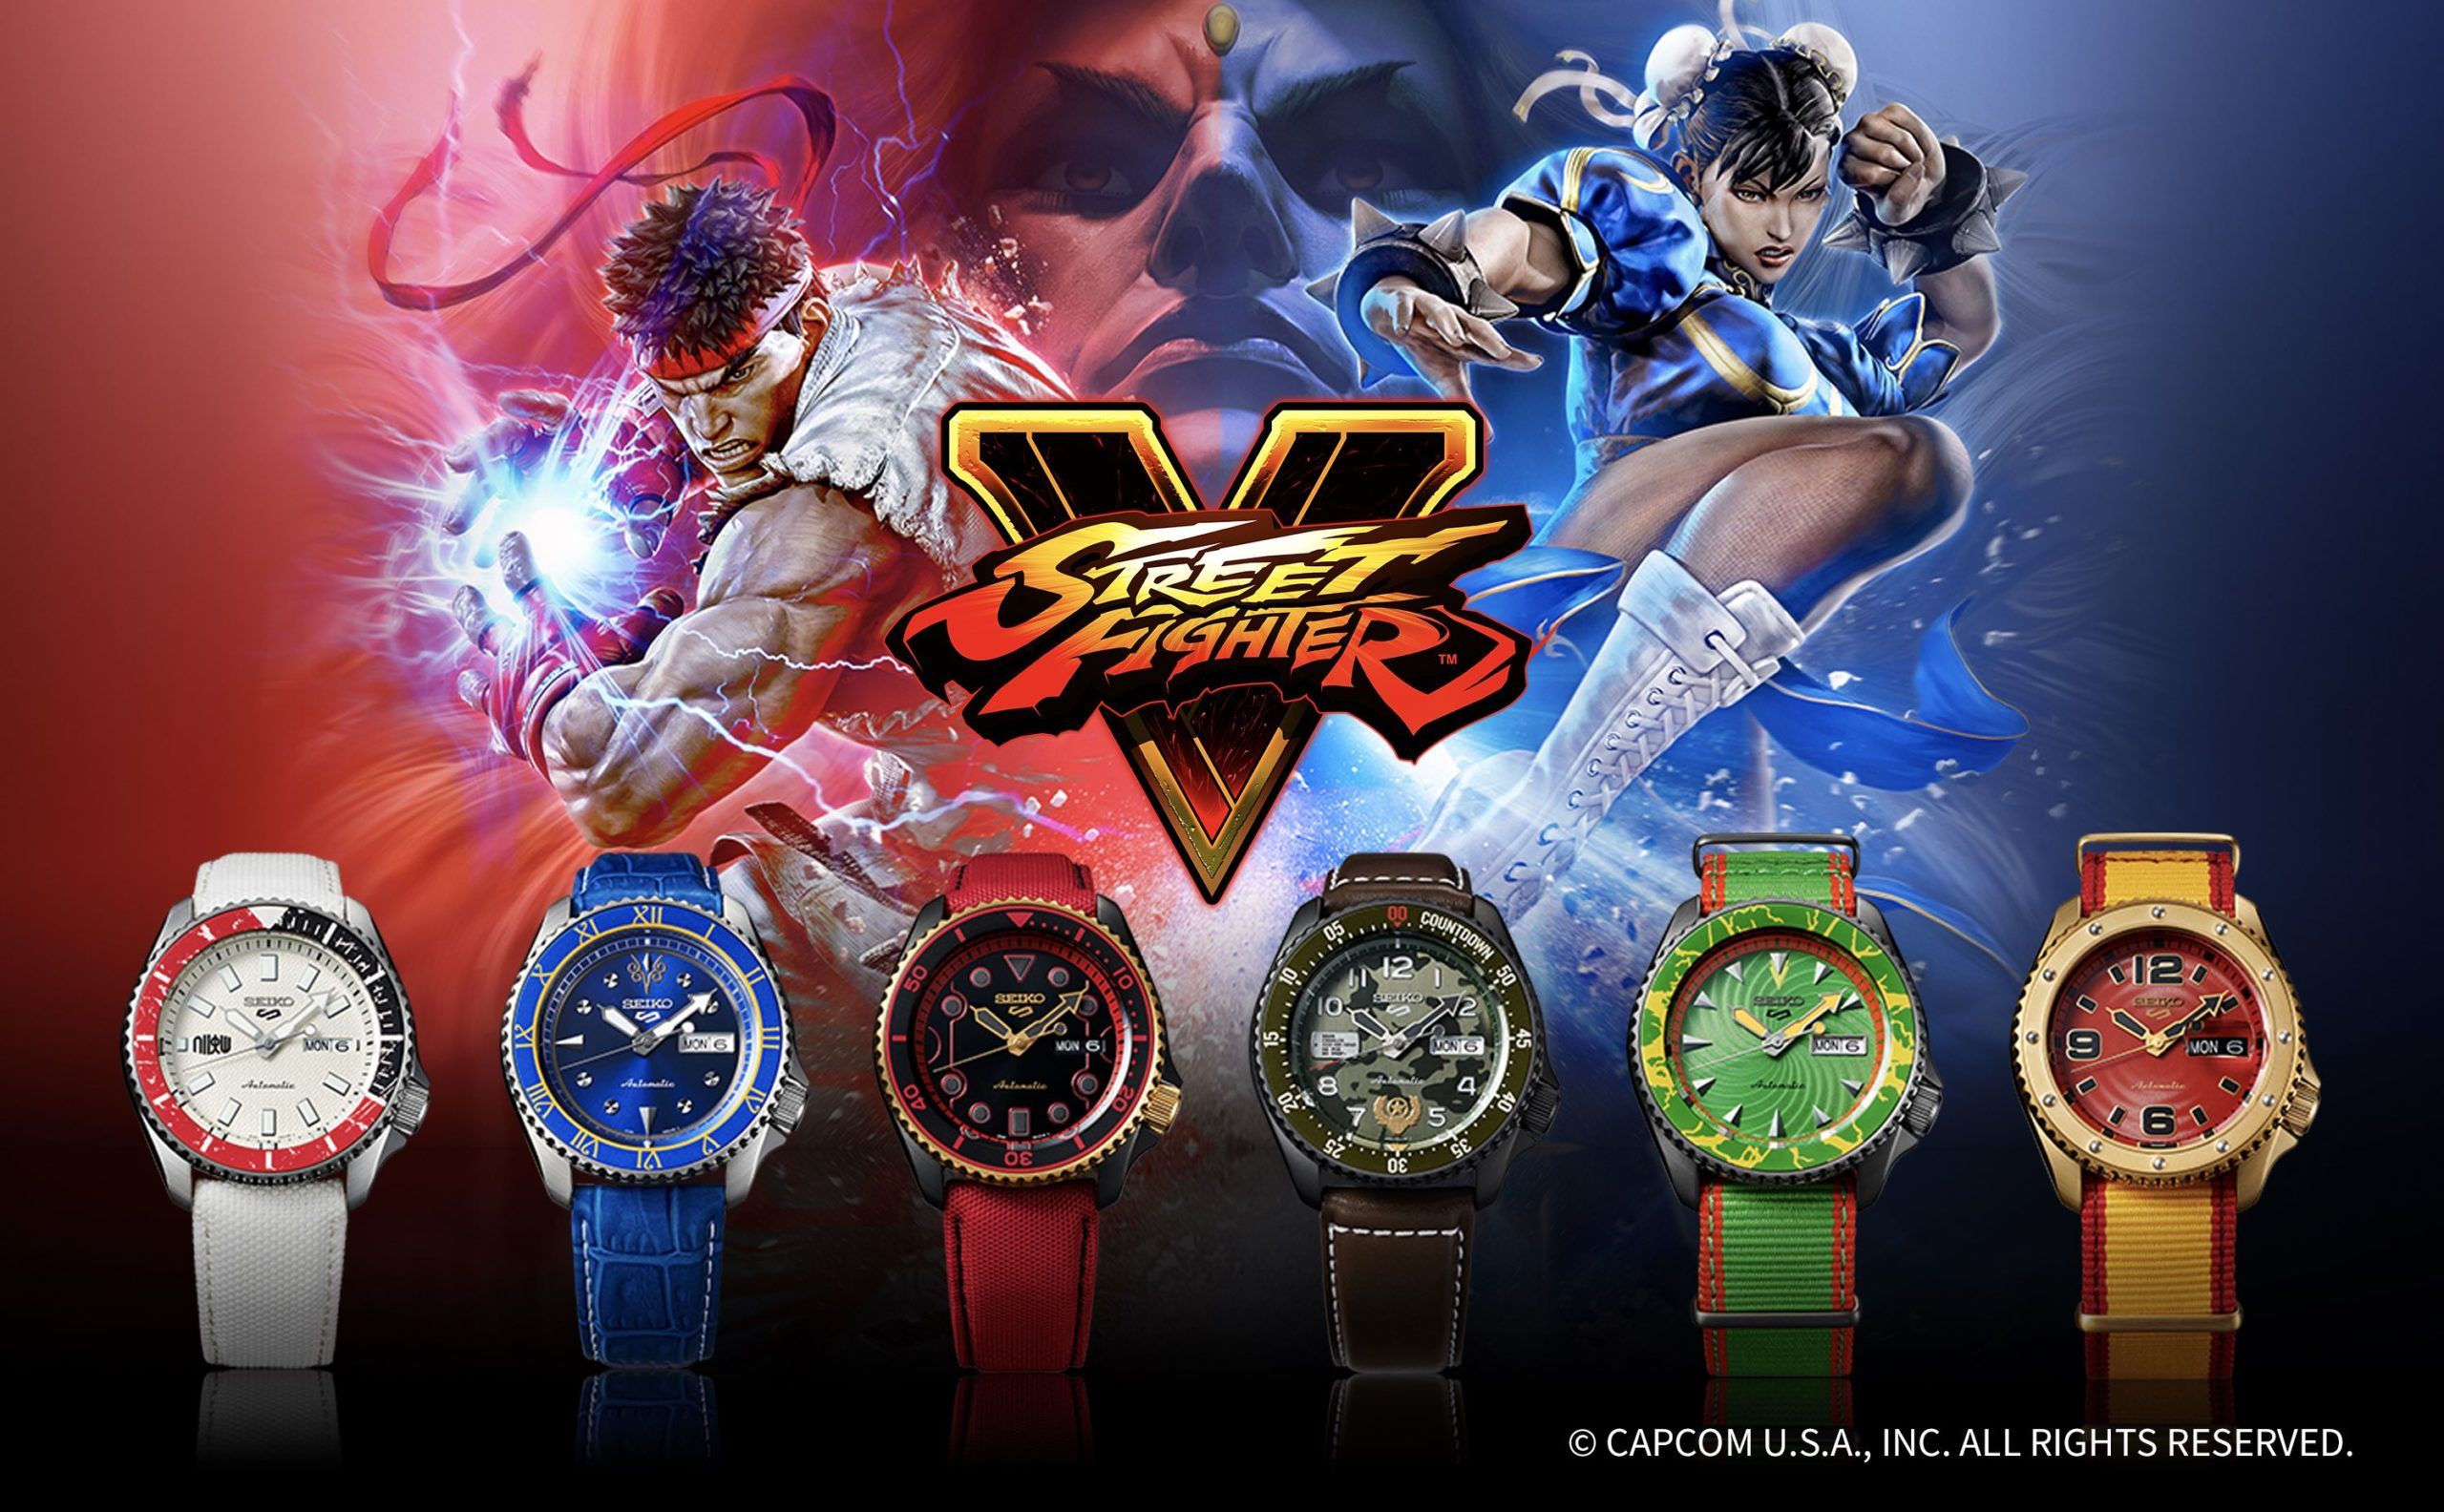 Round 1. FIGHT! Seiko Street Fighter Automatik-Uhr